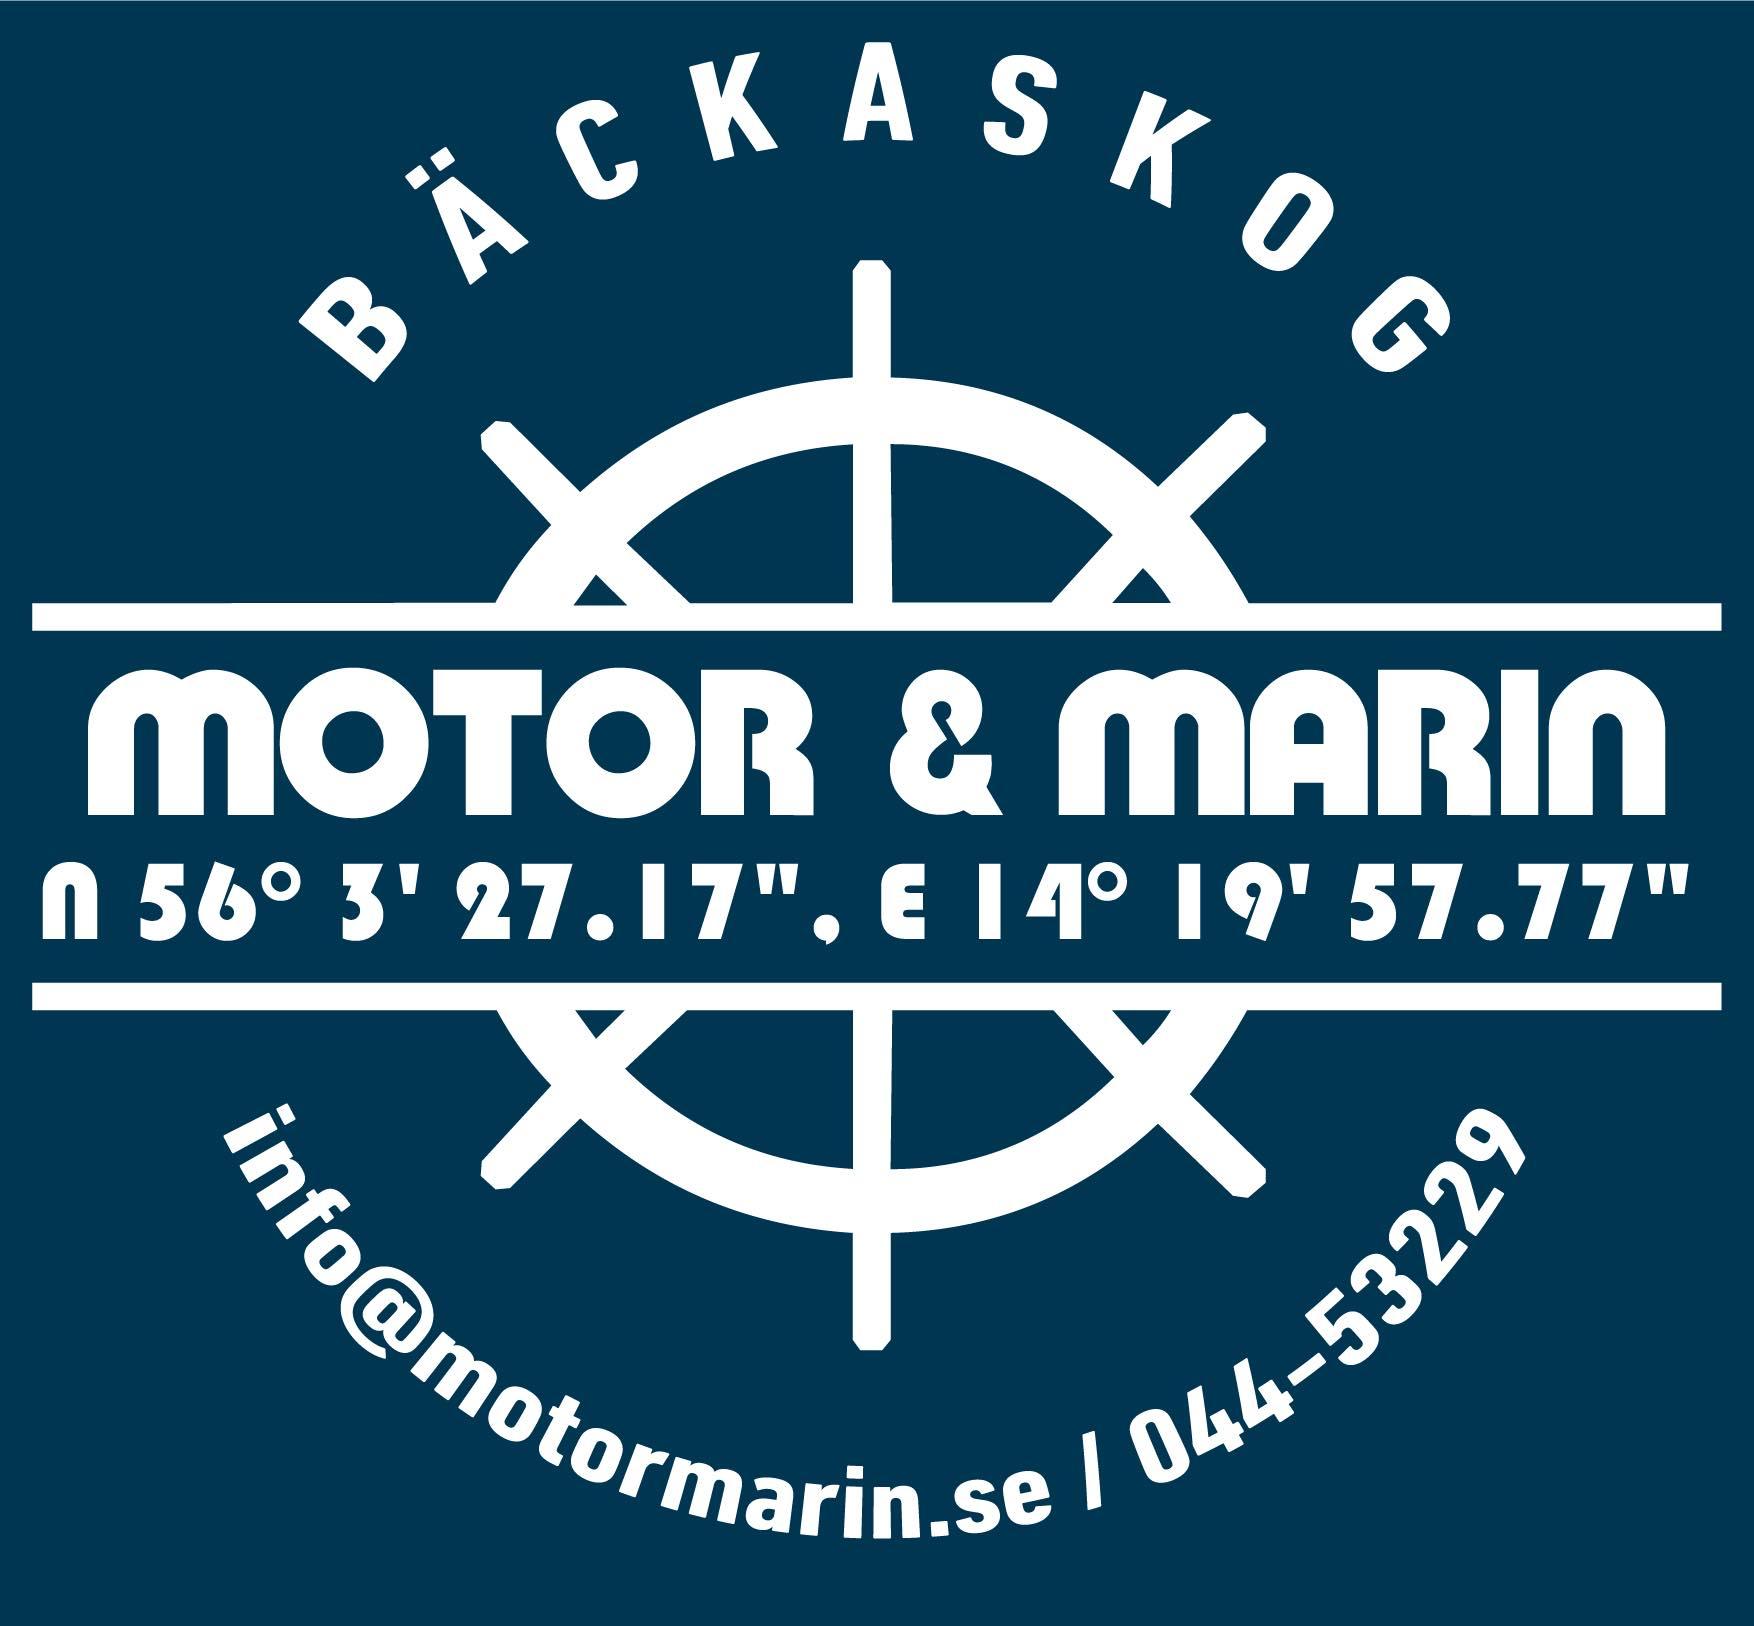 Motor Marin AB